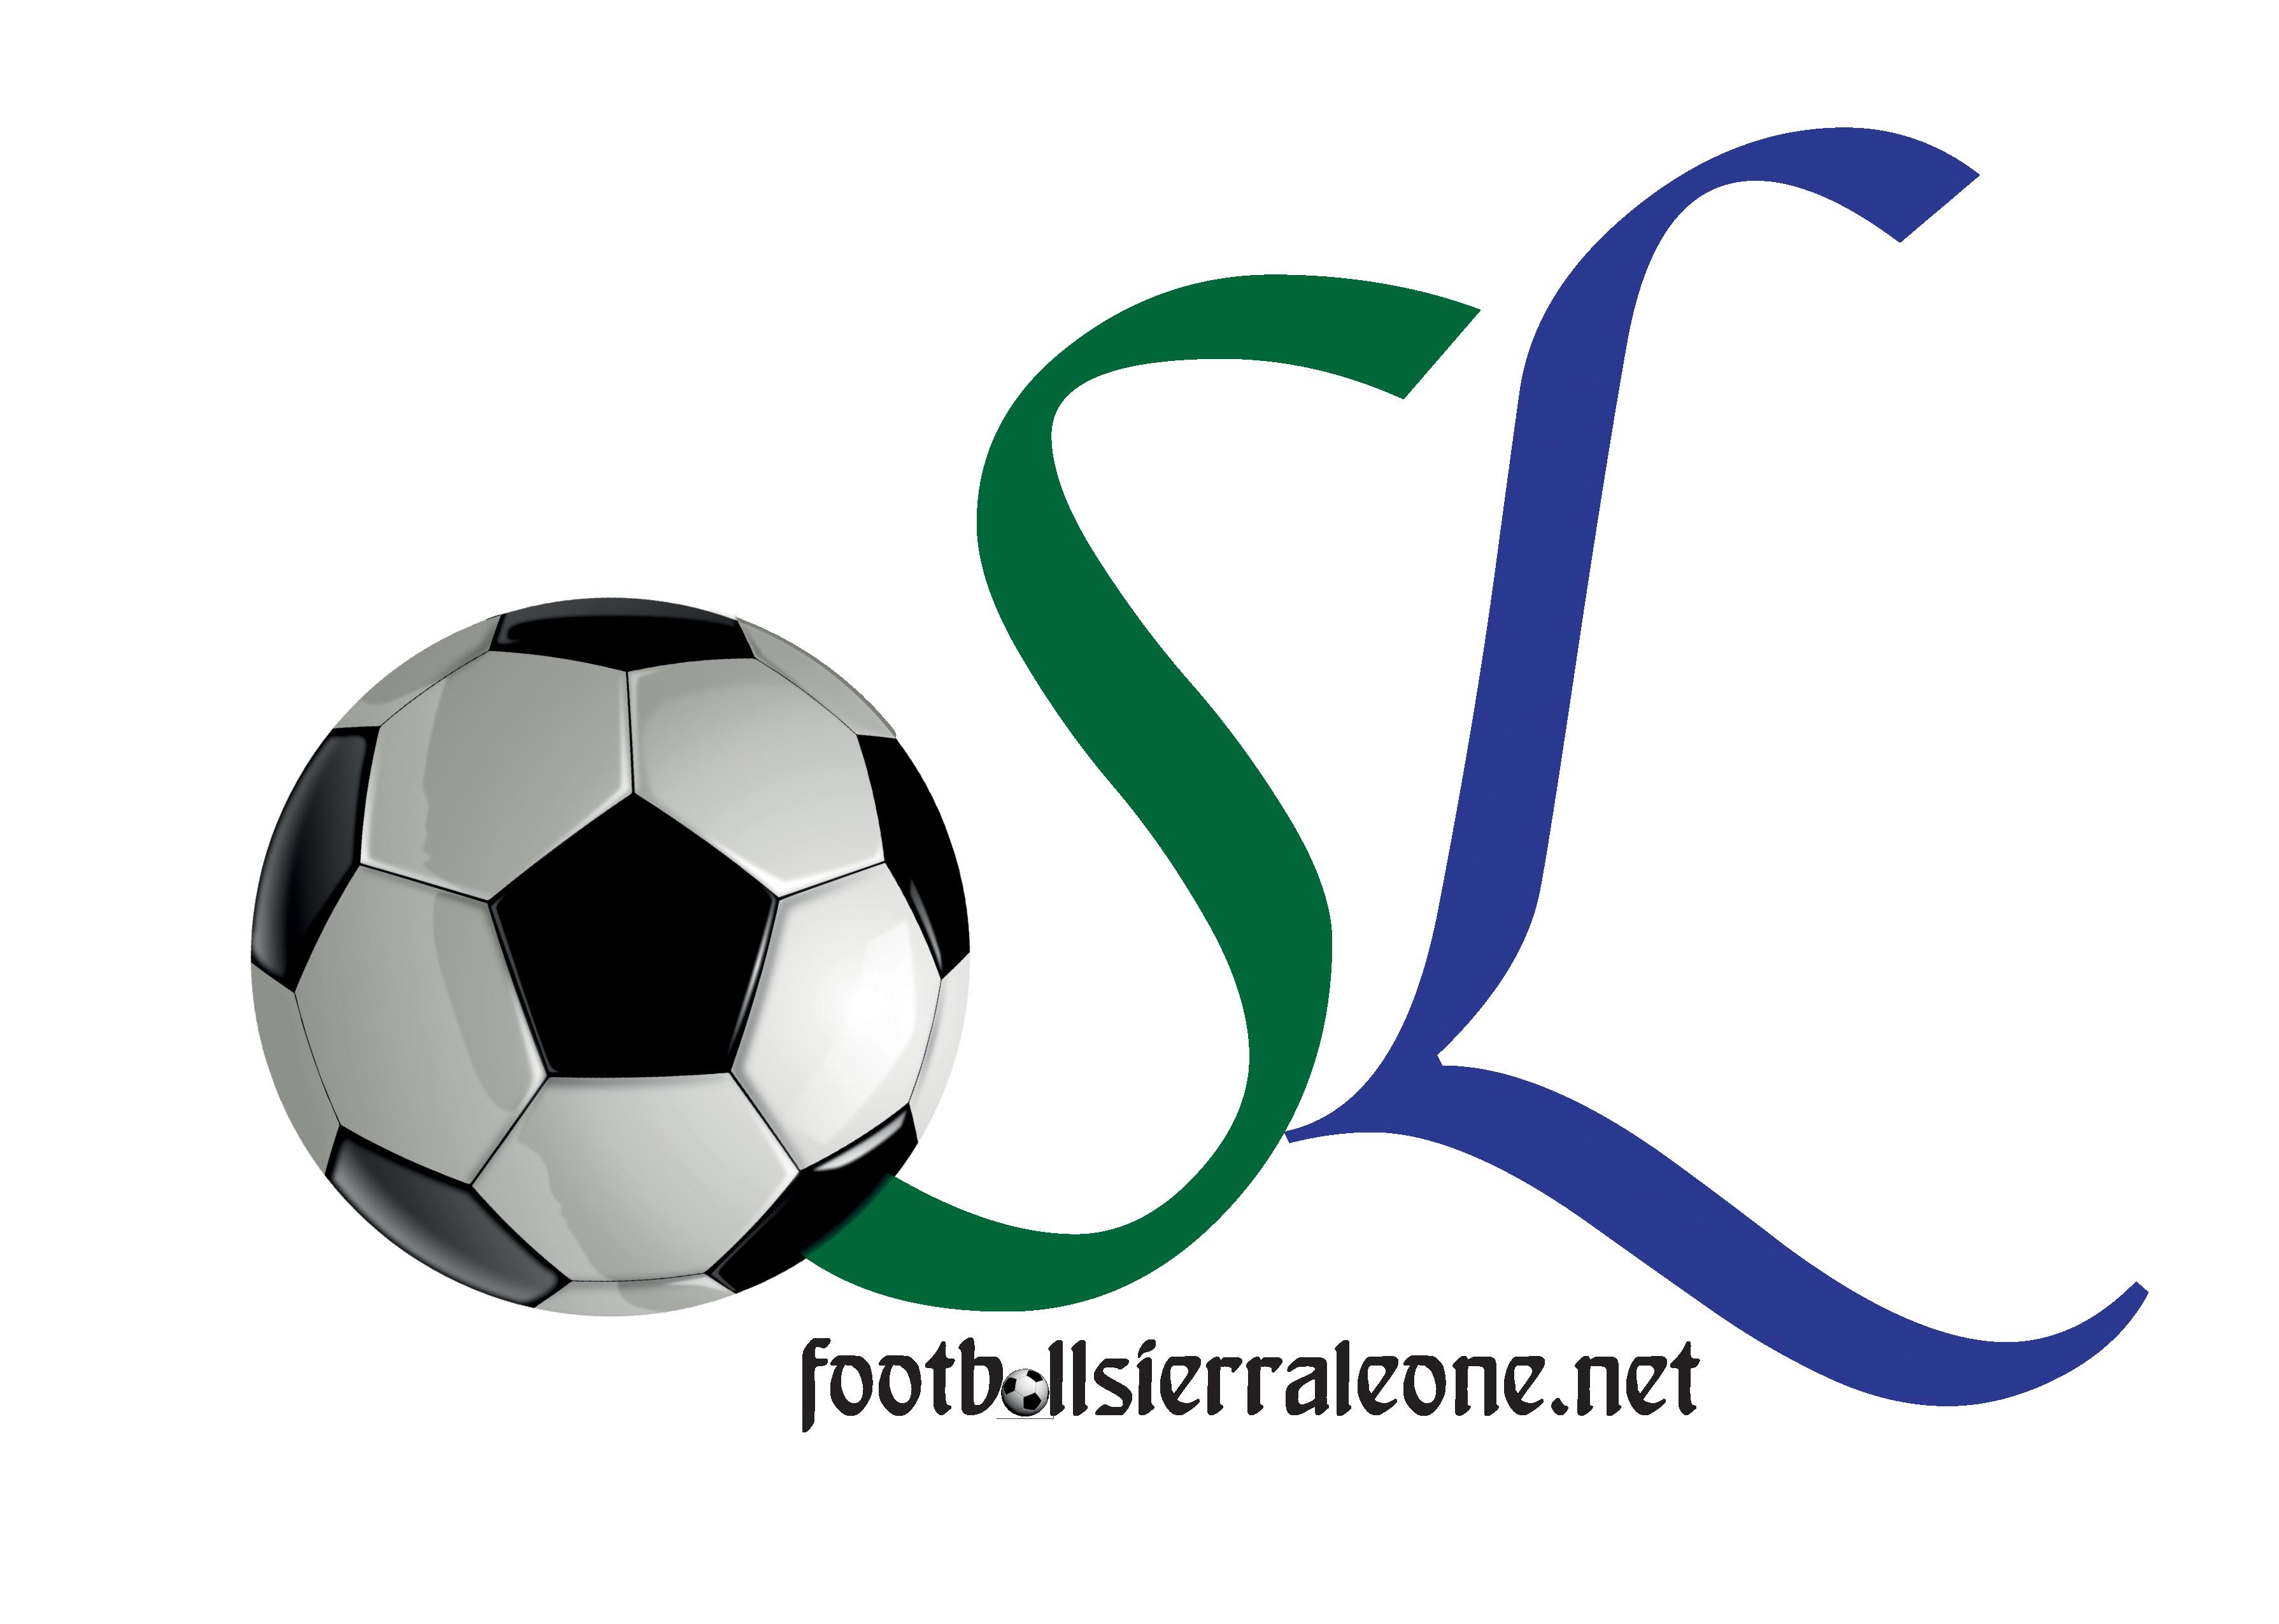 Football Sierra Leone